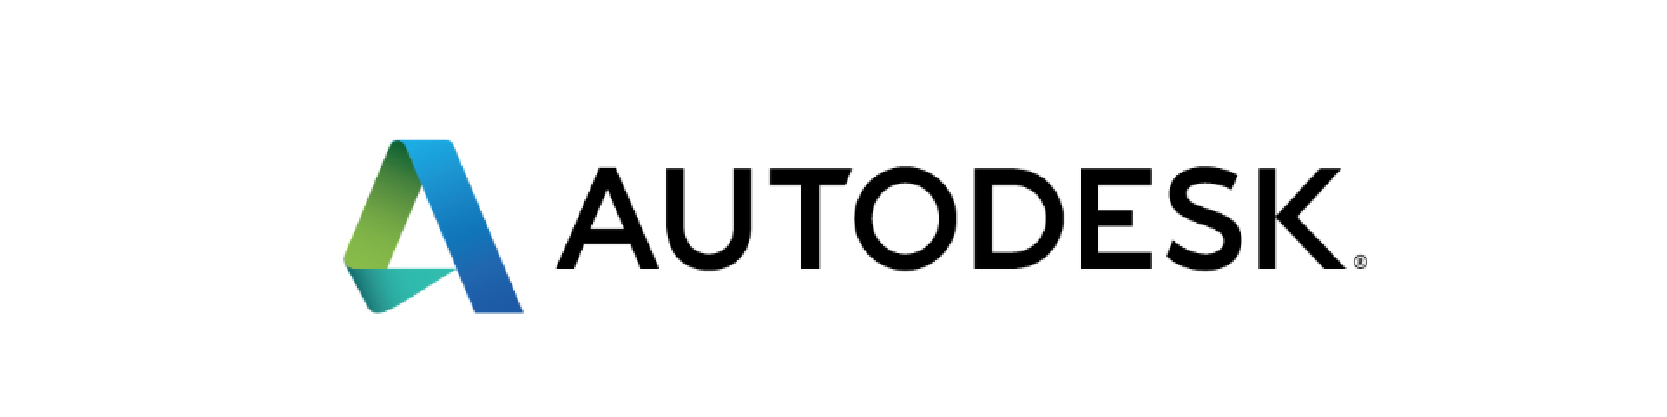 AutoDesk_Logo_400x100